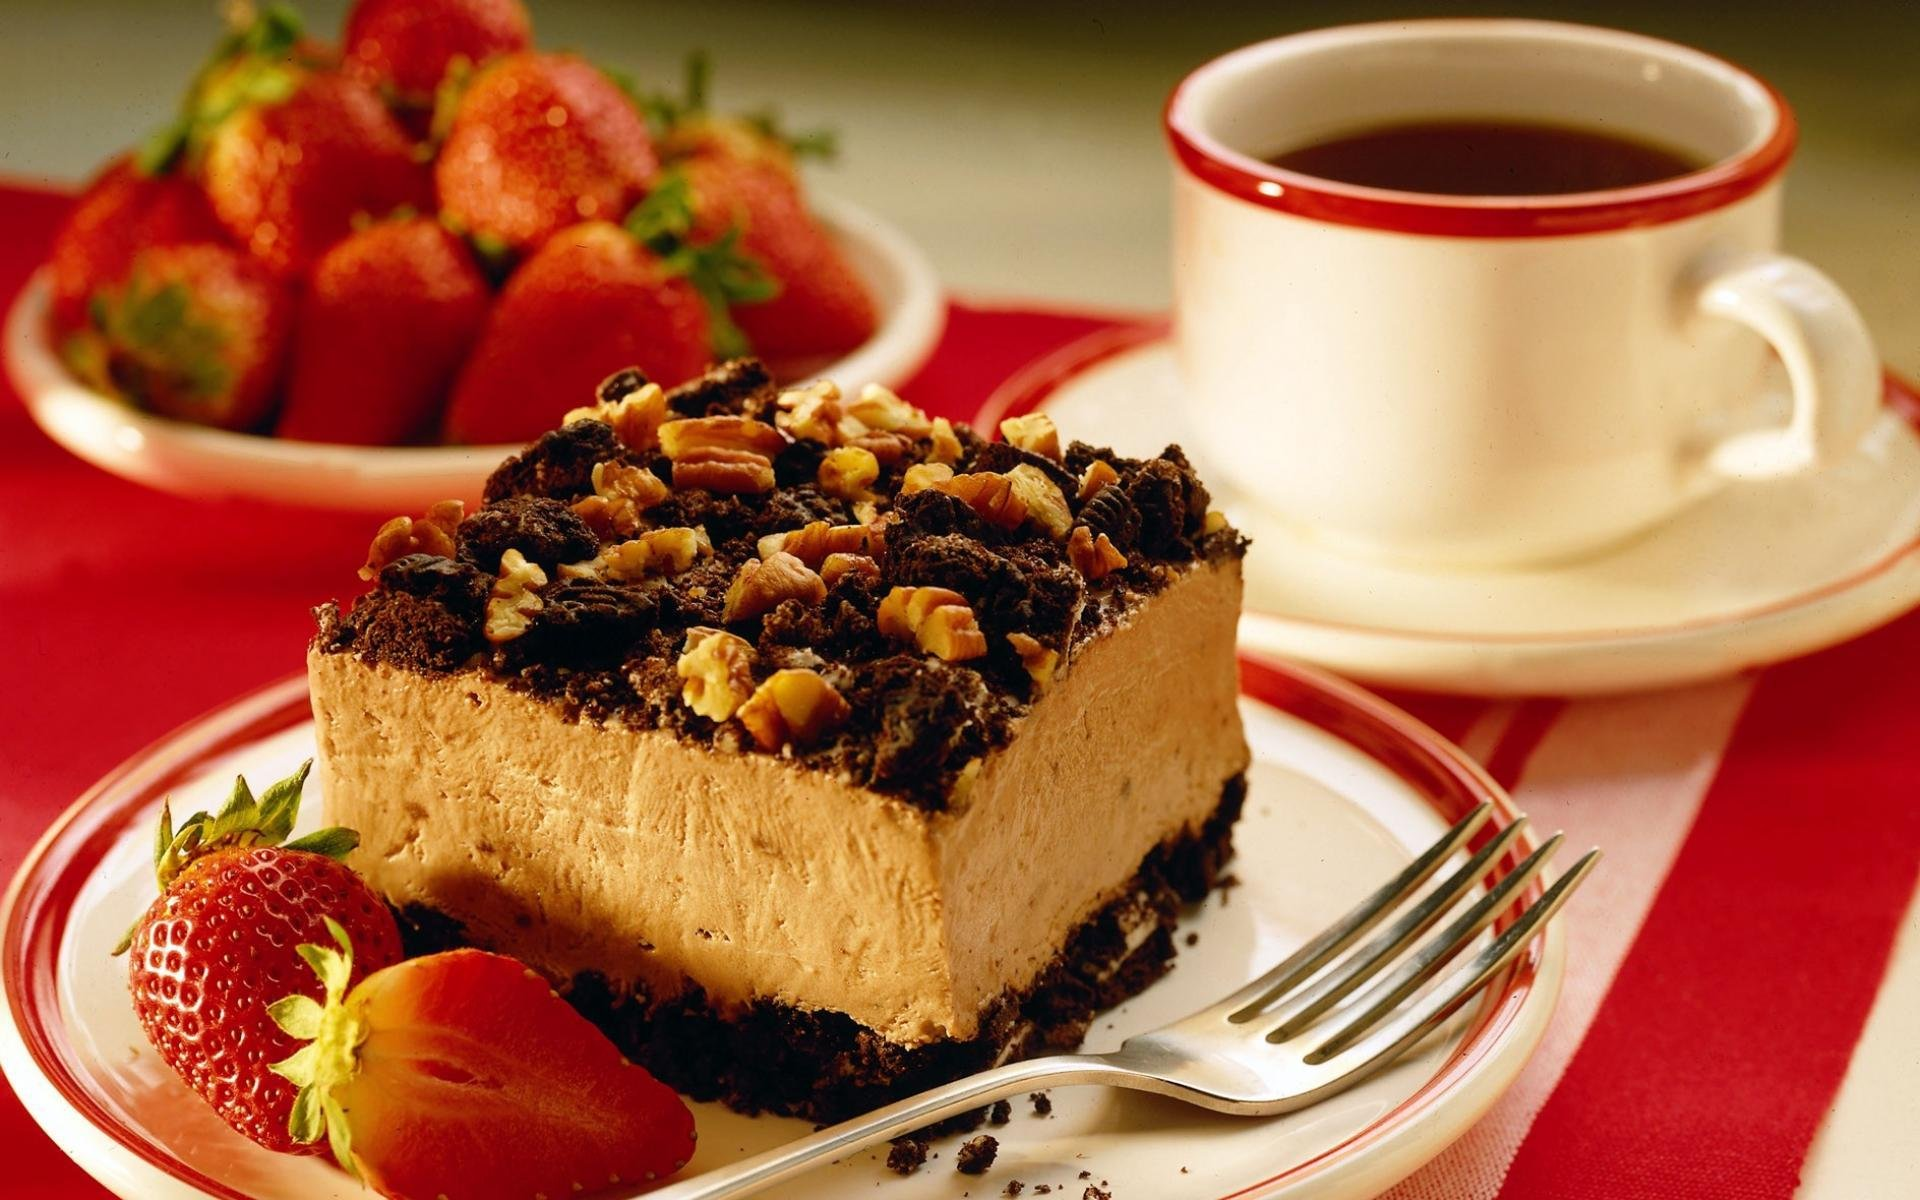 Торт и кофе картинка